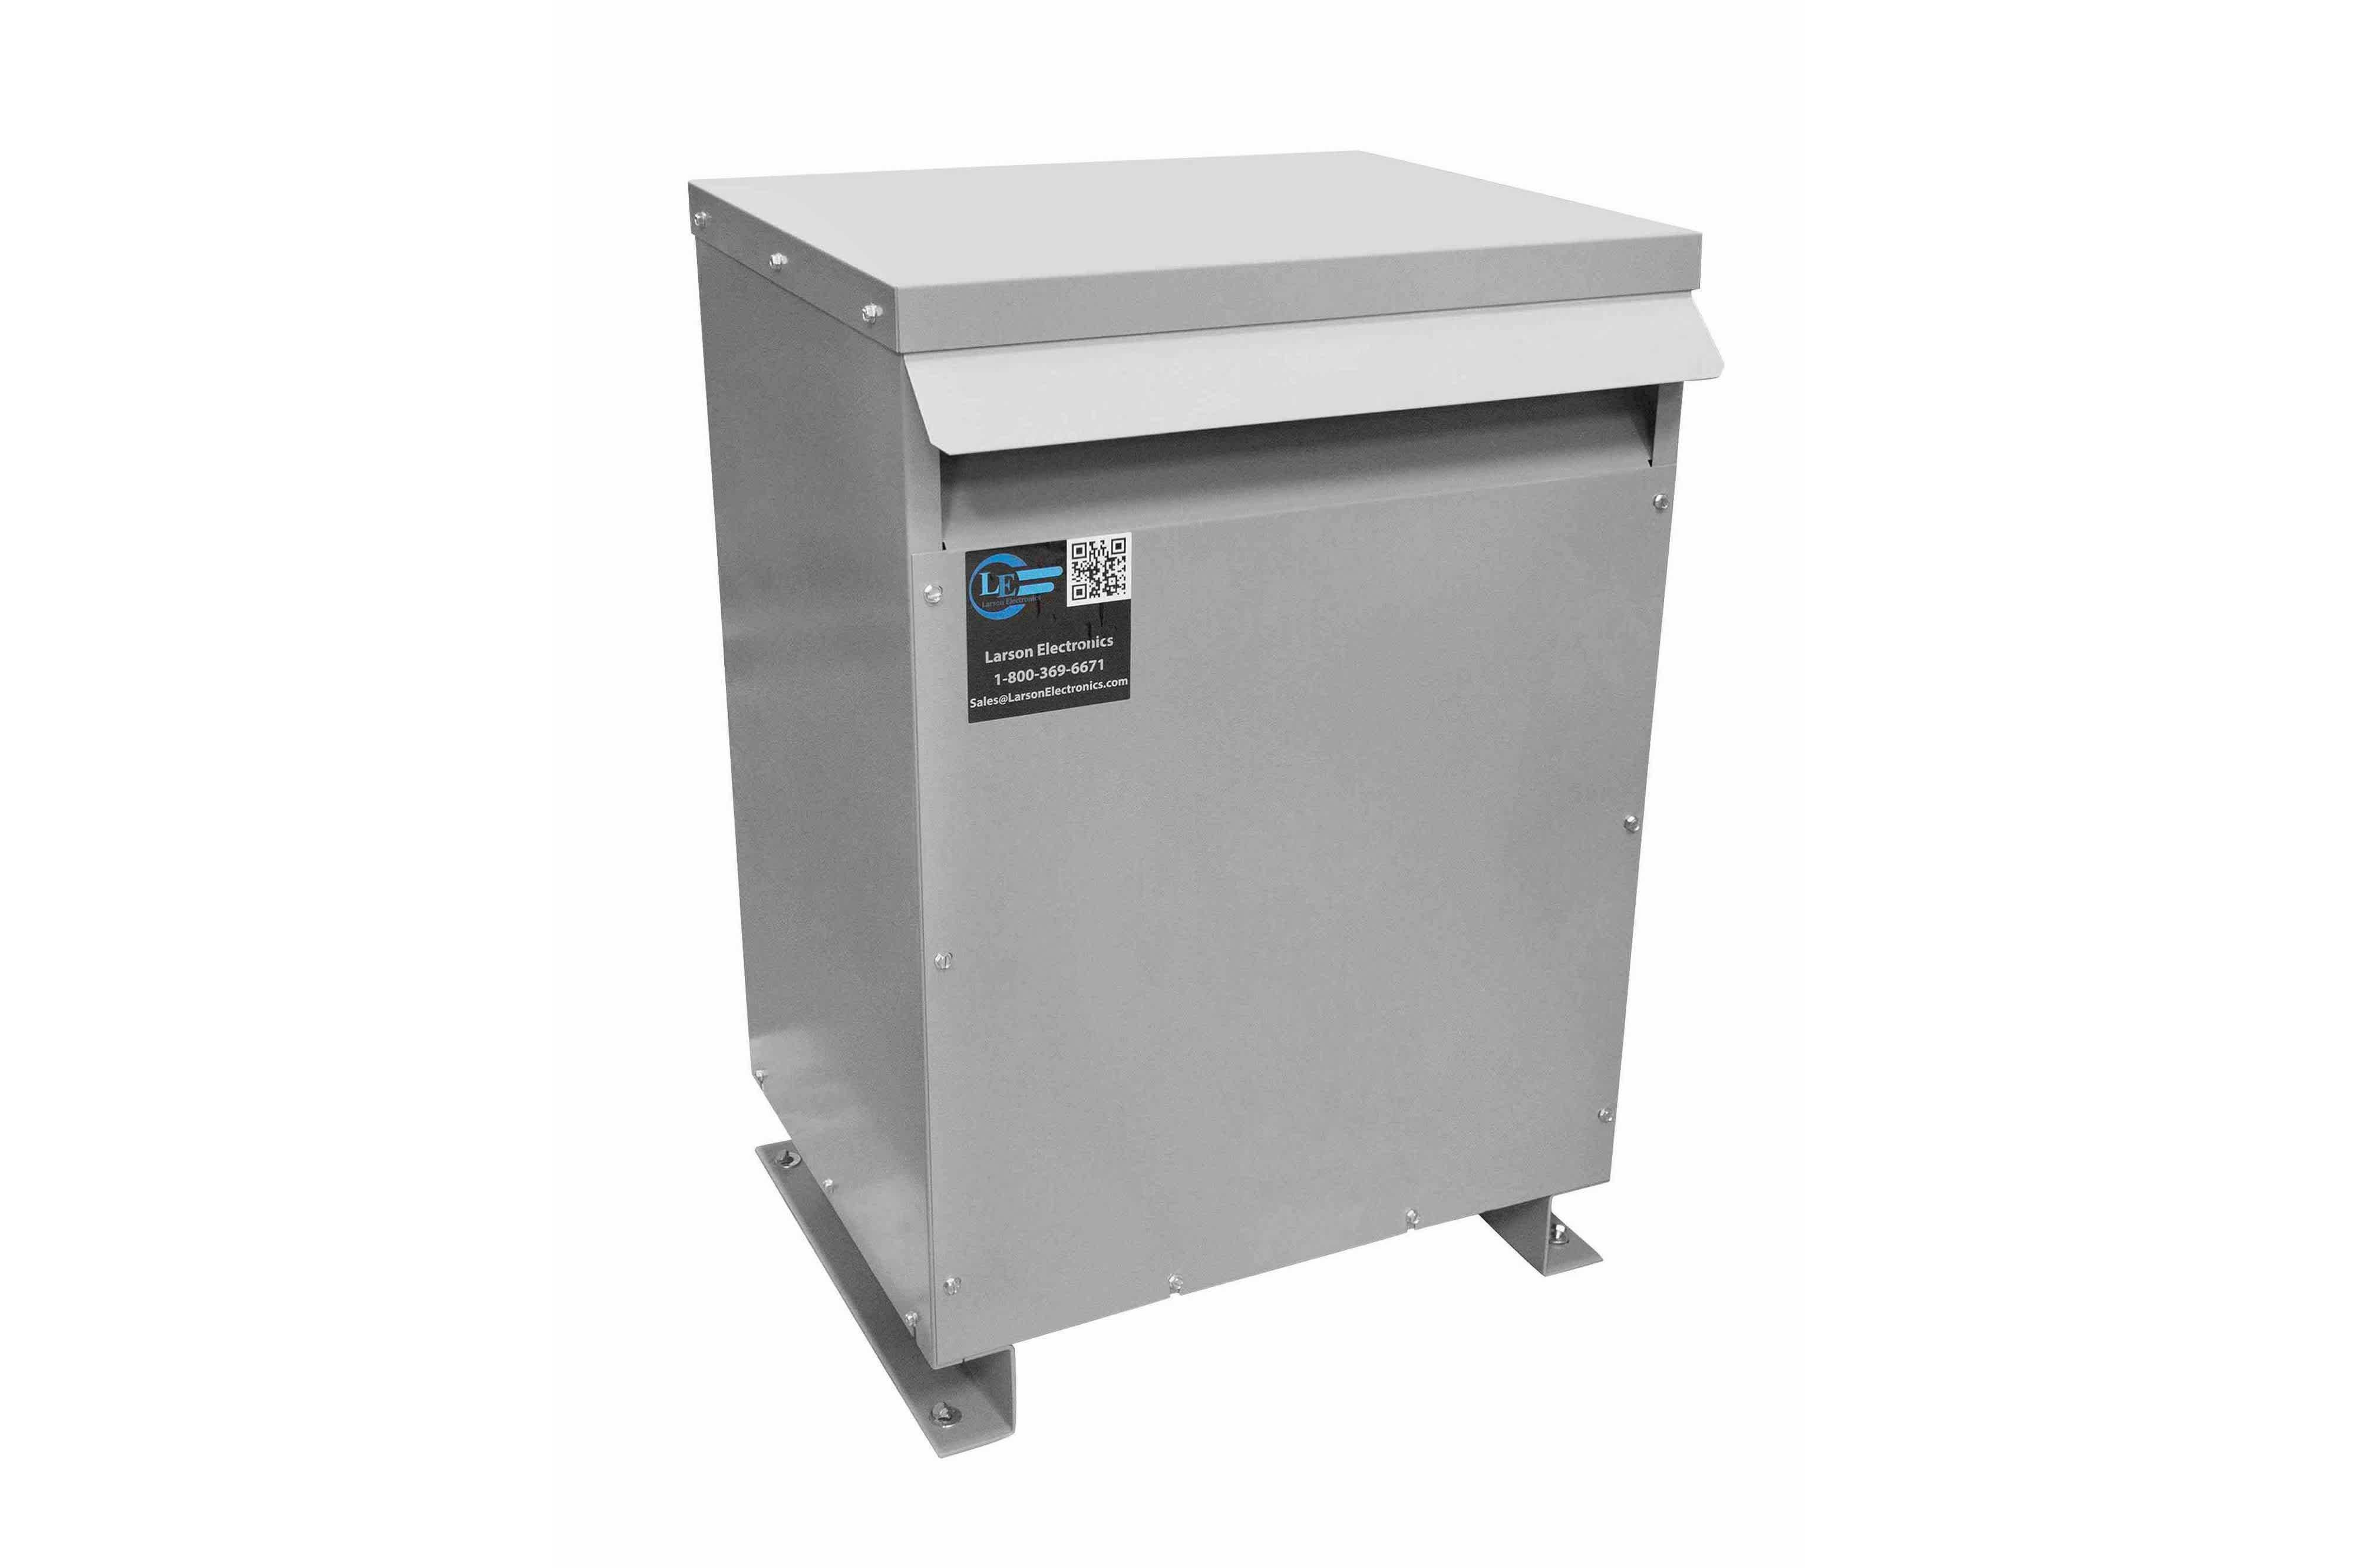 100 kVA 3PH Isolation Transformer, 575V Wye Primary, 480V Delta Secondary, N3R, Ventilated, 60 Hz